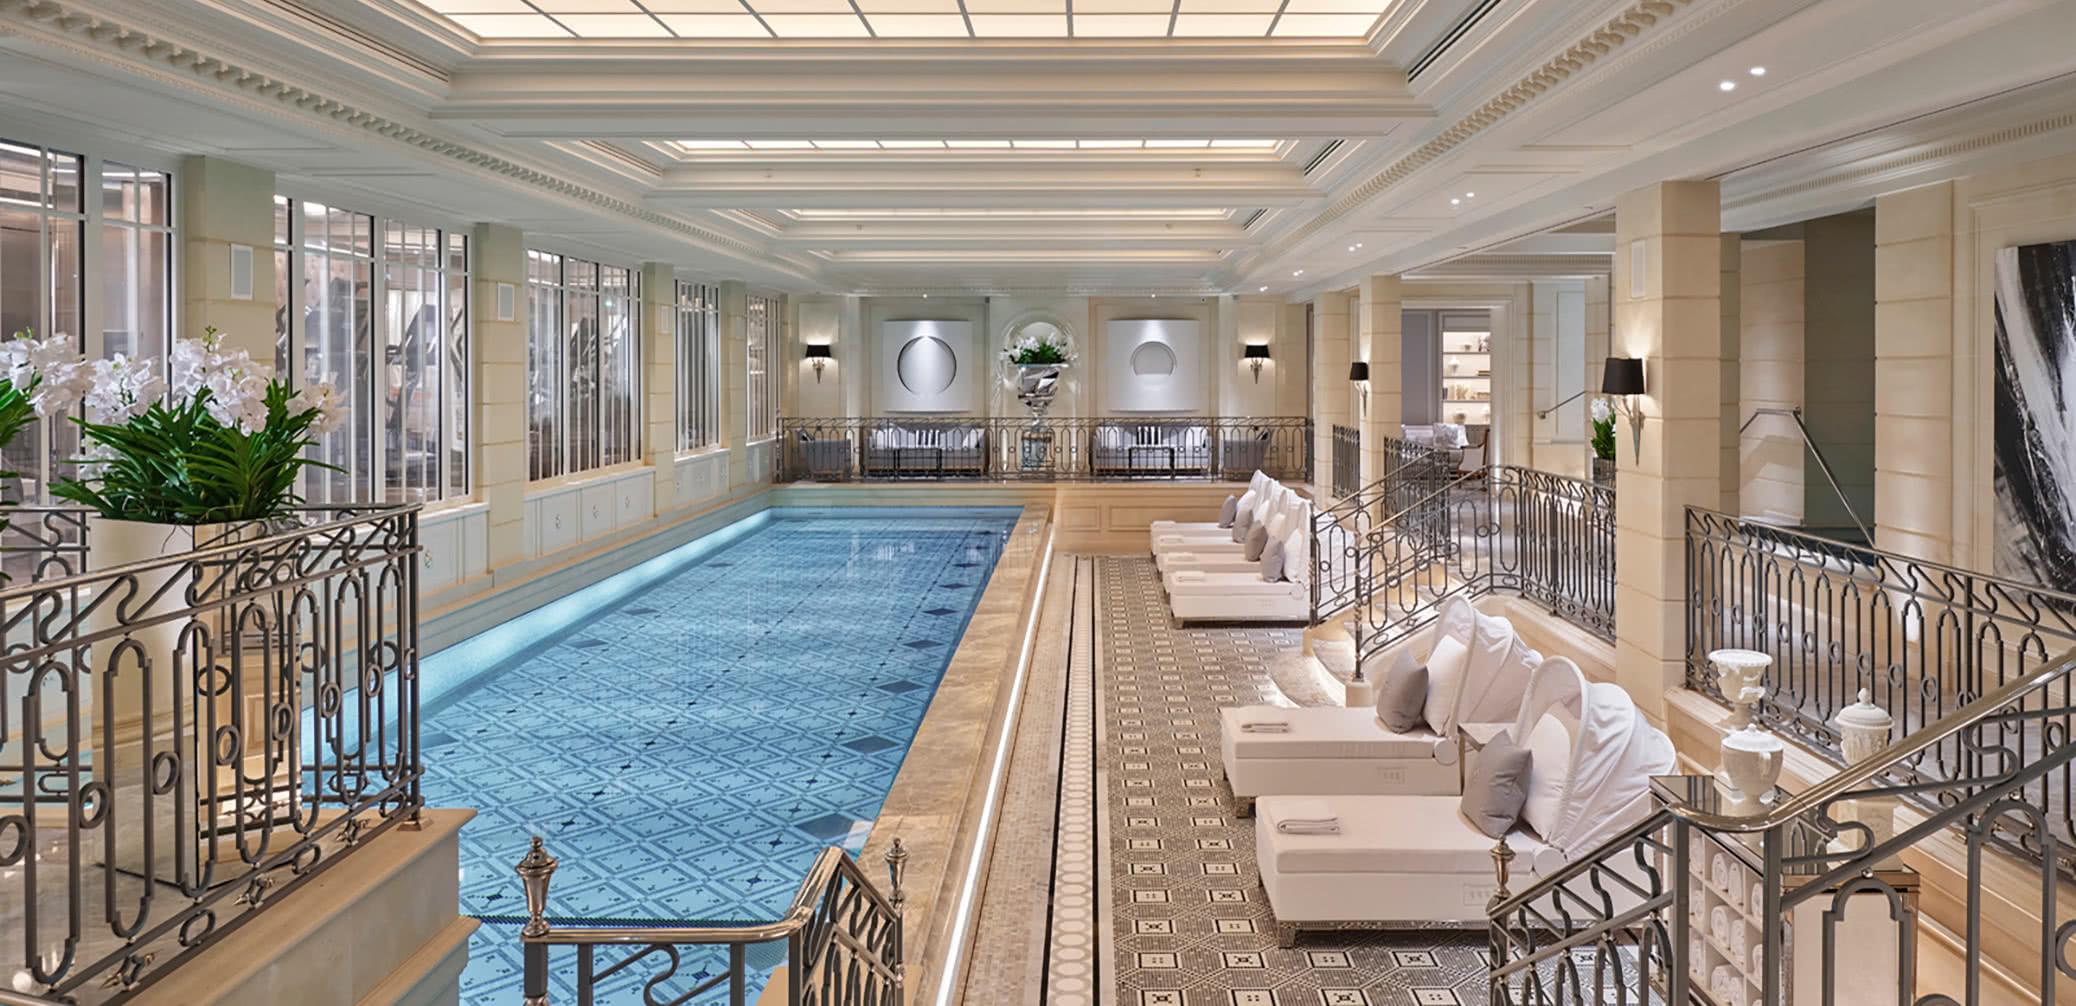 Top 10 Best Luxury Hotels With Pools In Paris